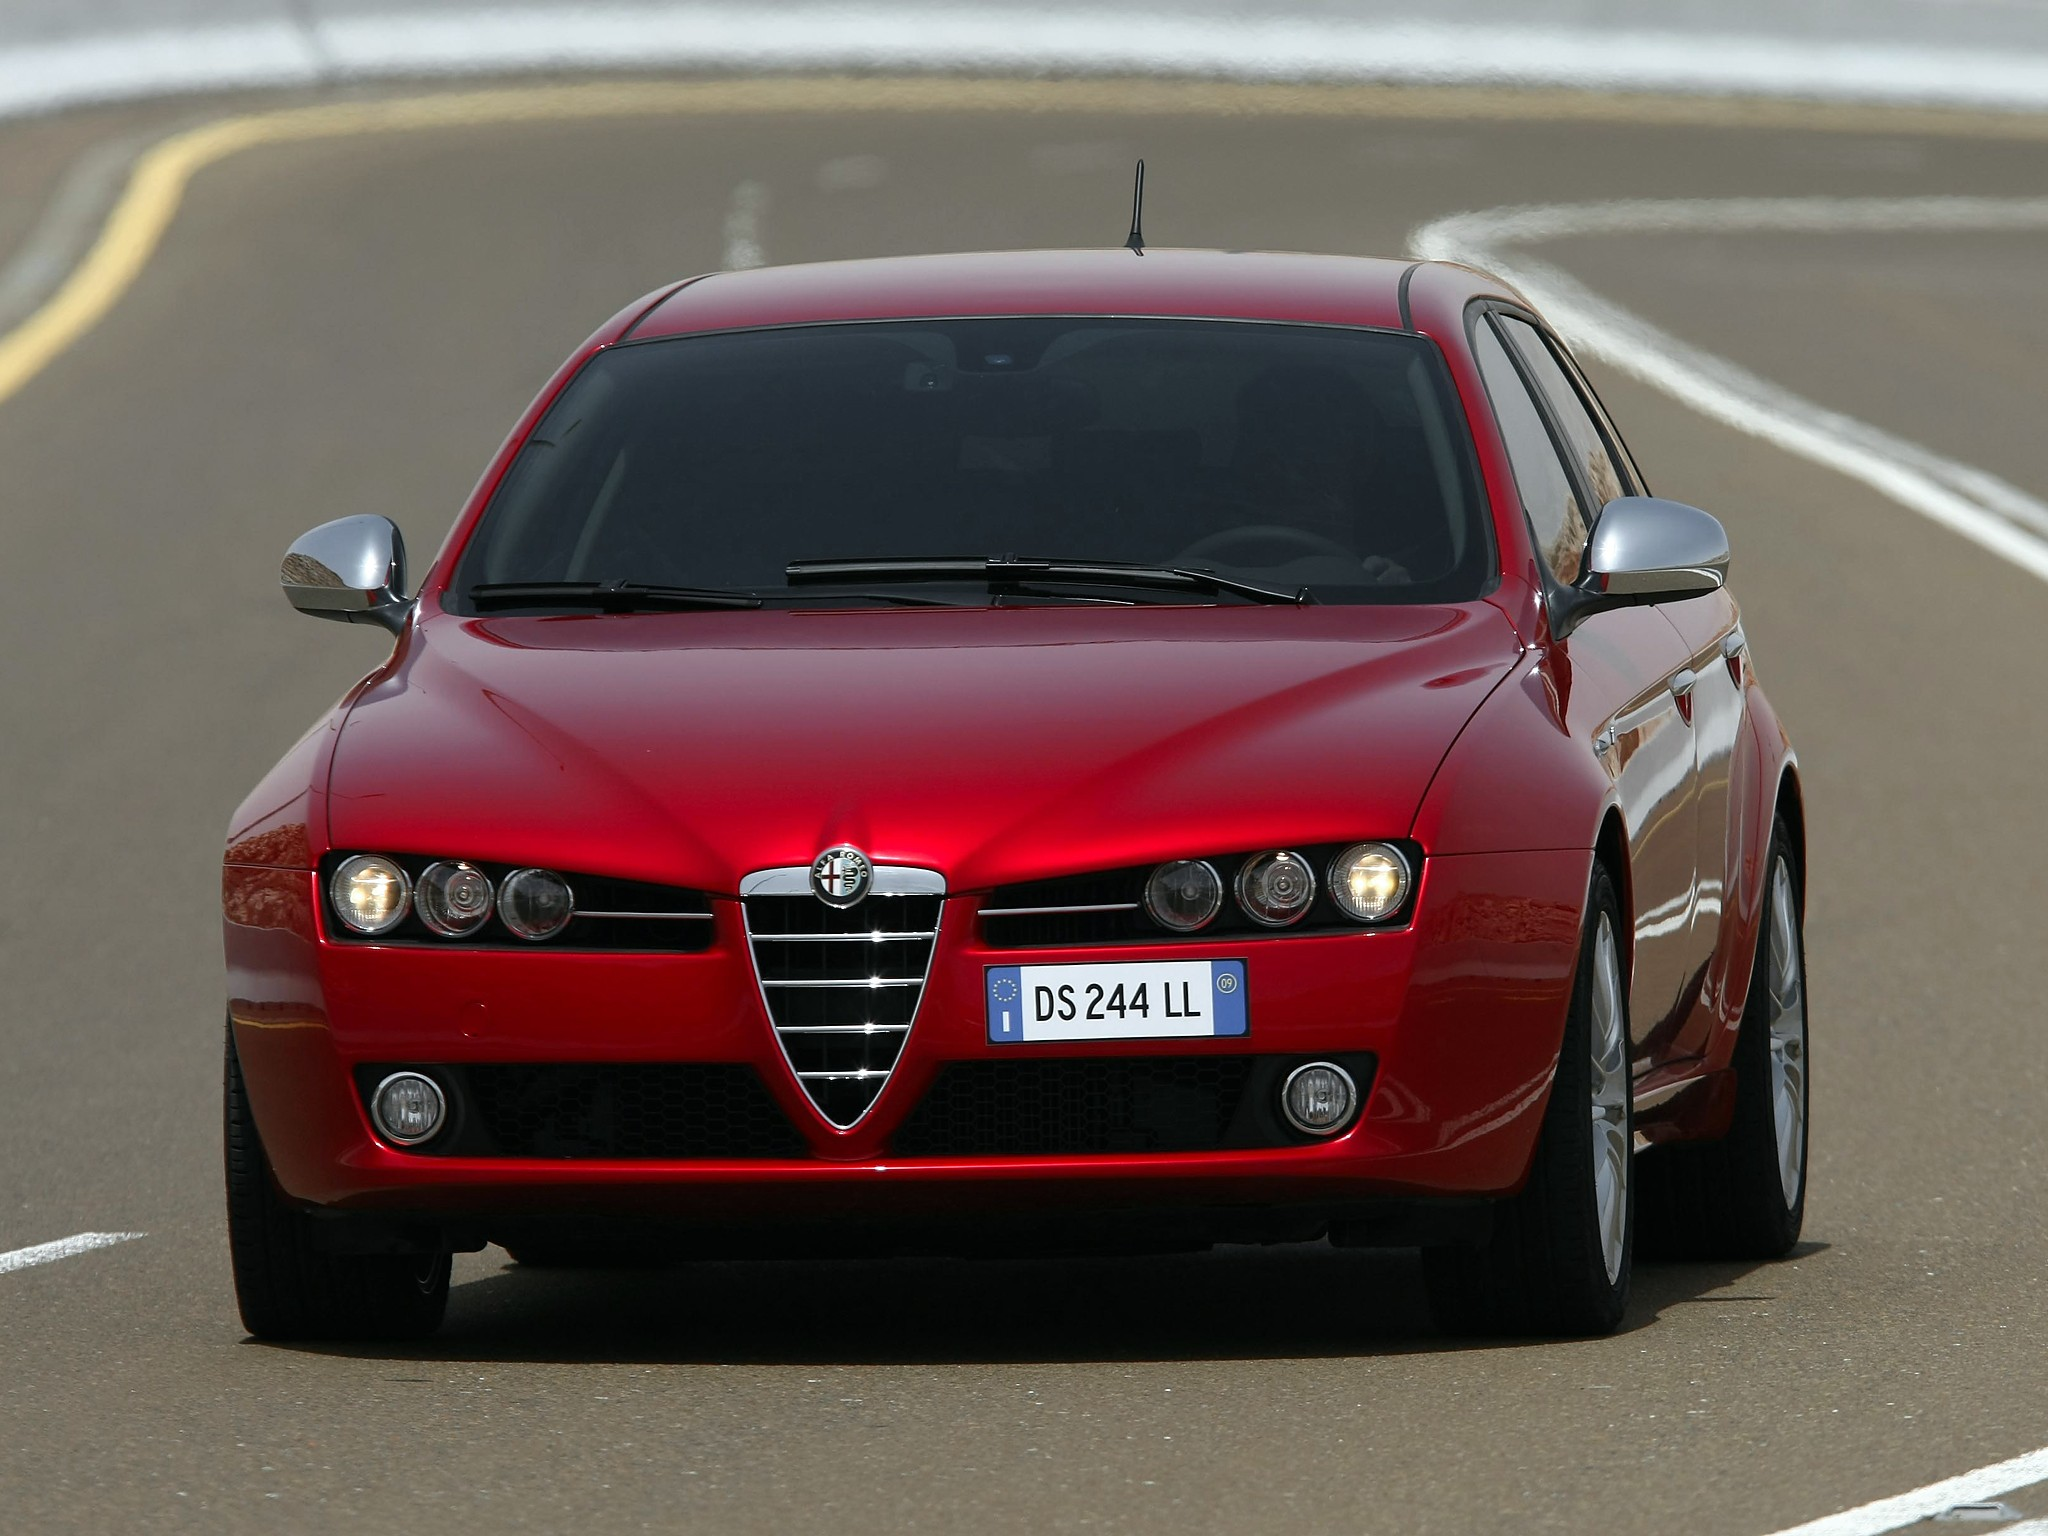 ALFA ROMEO 159 Sportwagon - 2006, 2007, 2008, 2009, 2010 ...